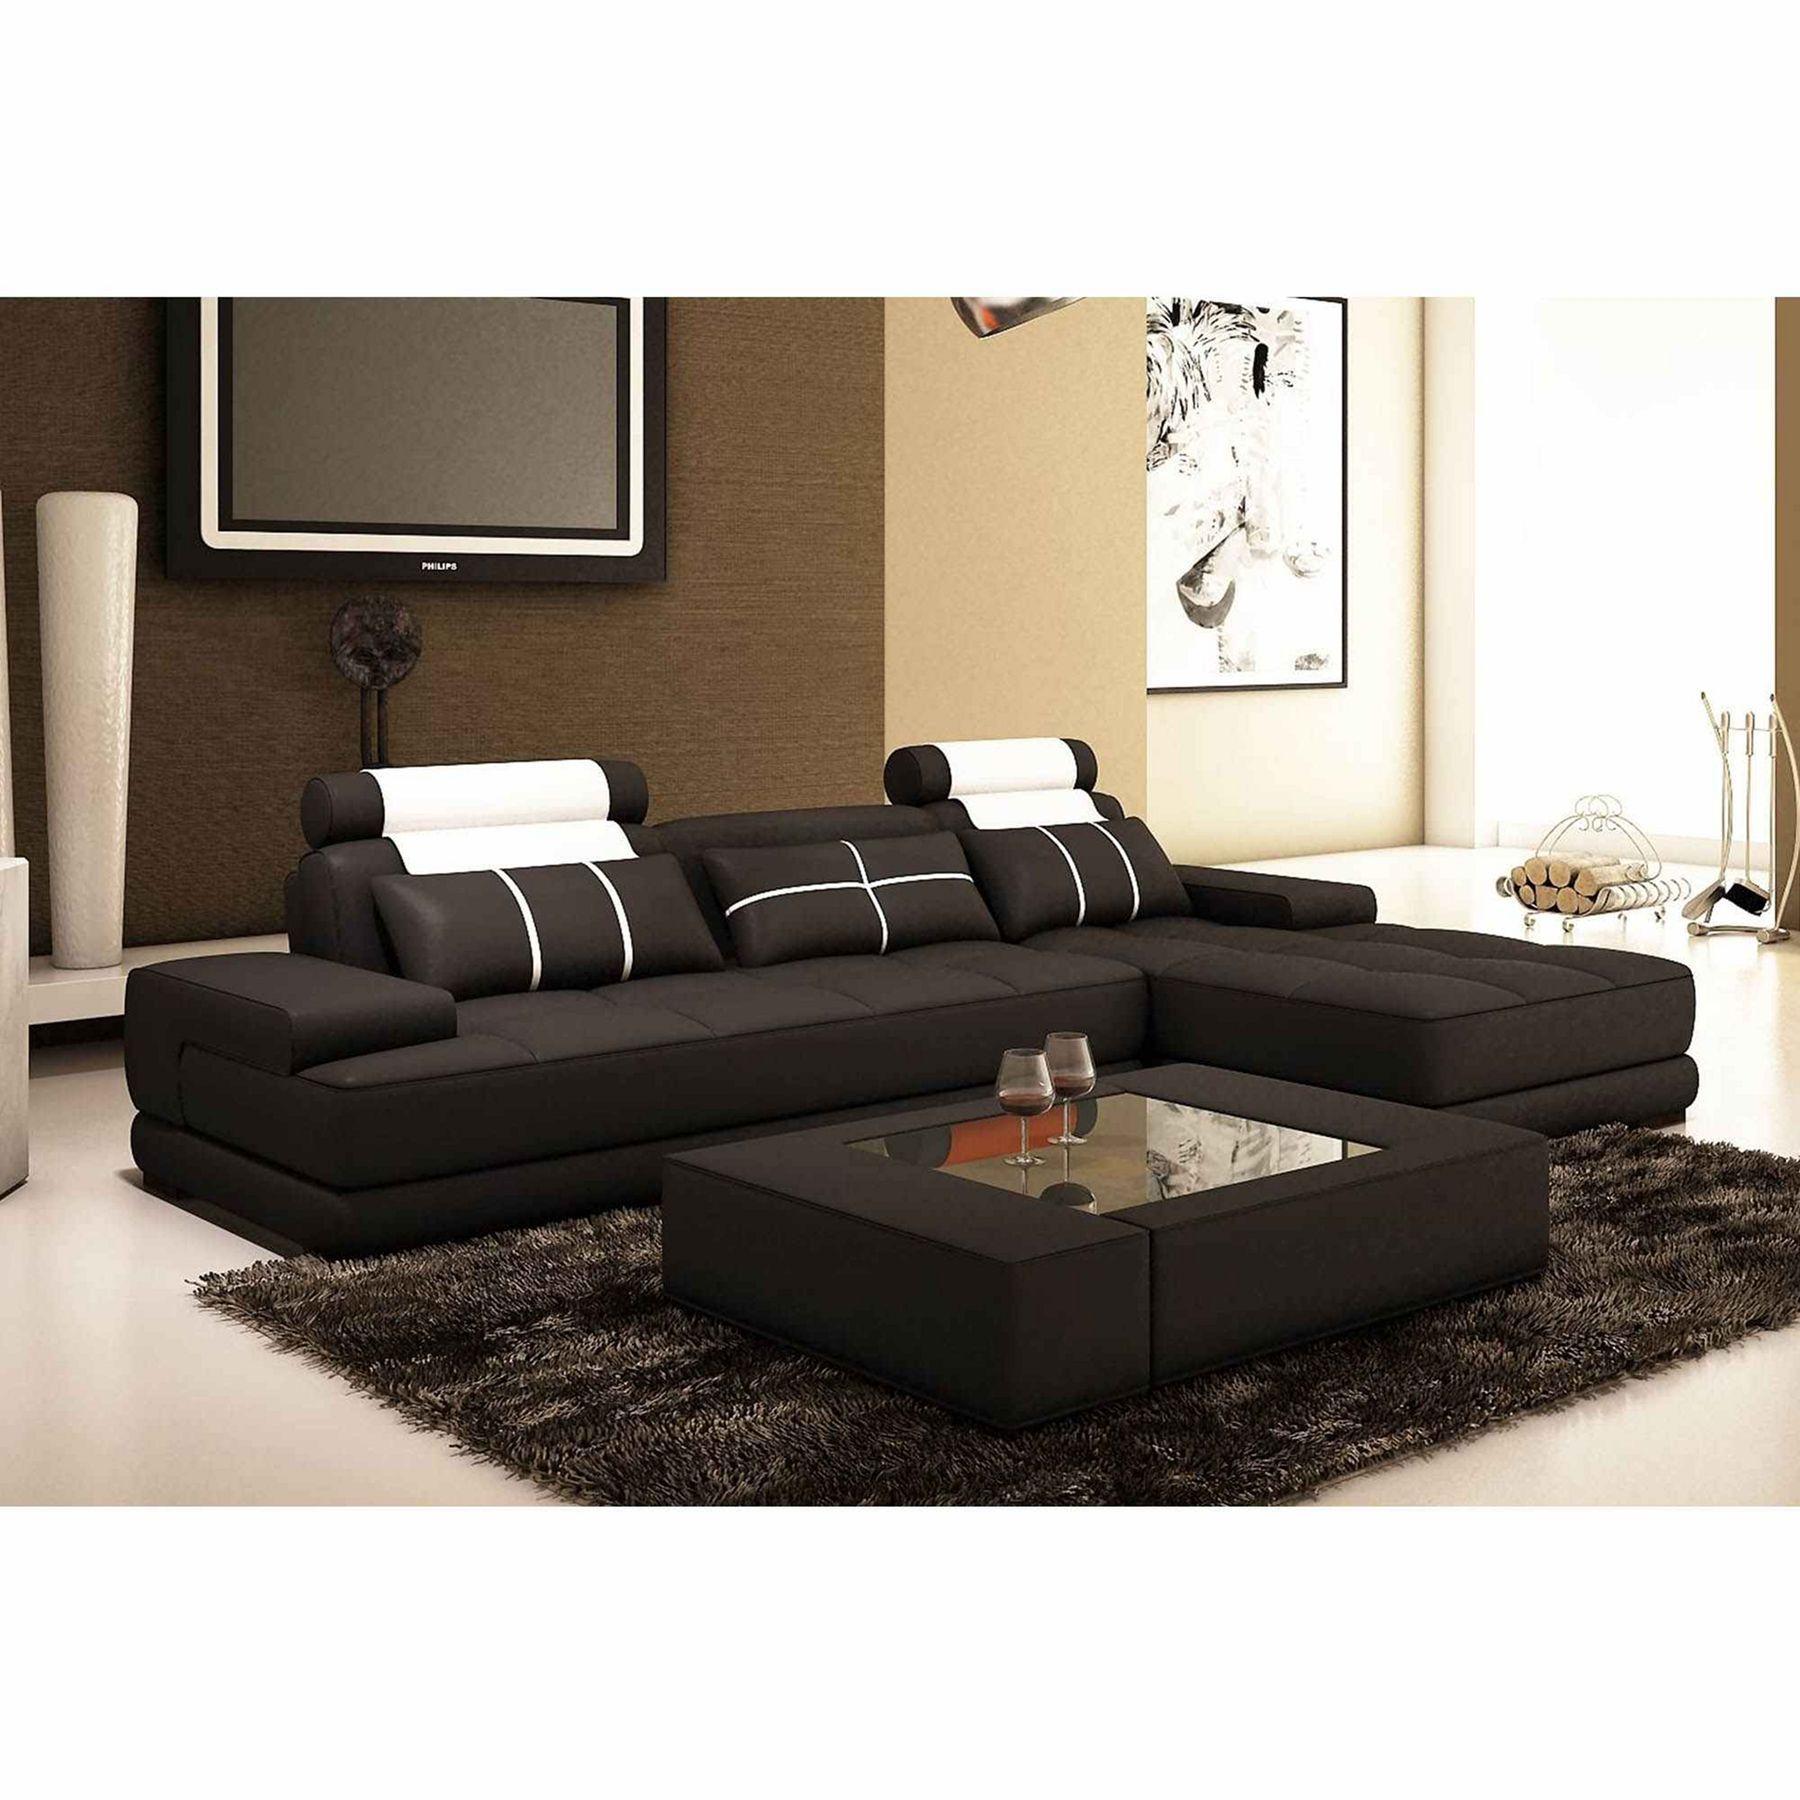 12 L Shaped Sofa Furniture Ideas For Awesome Modern Living Rooms Black Modern Sofa Living Room Modern Sofa Furniture